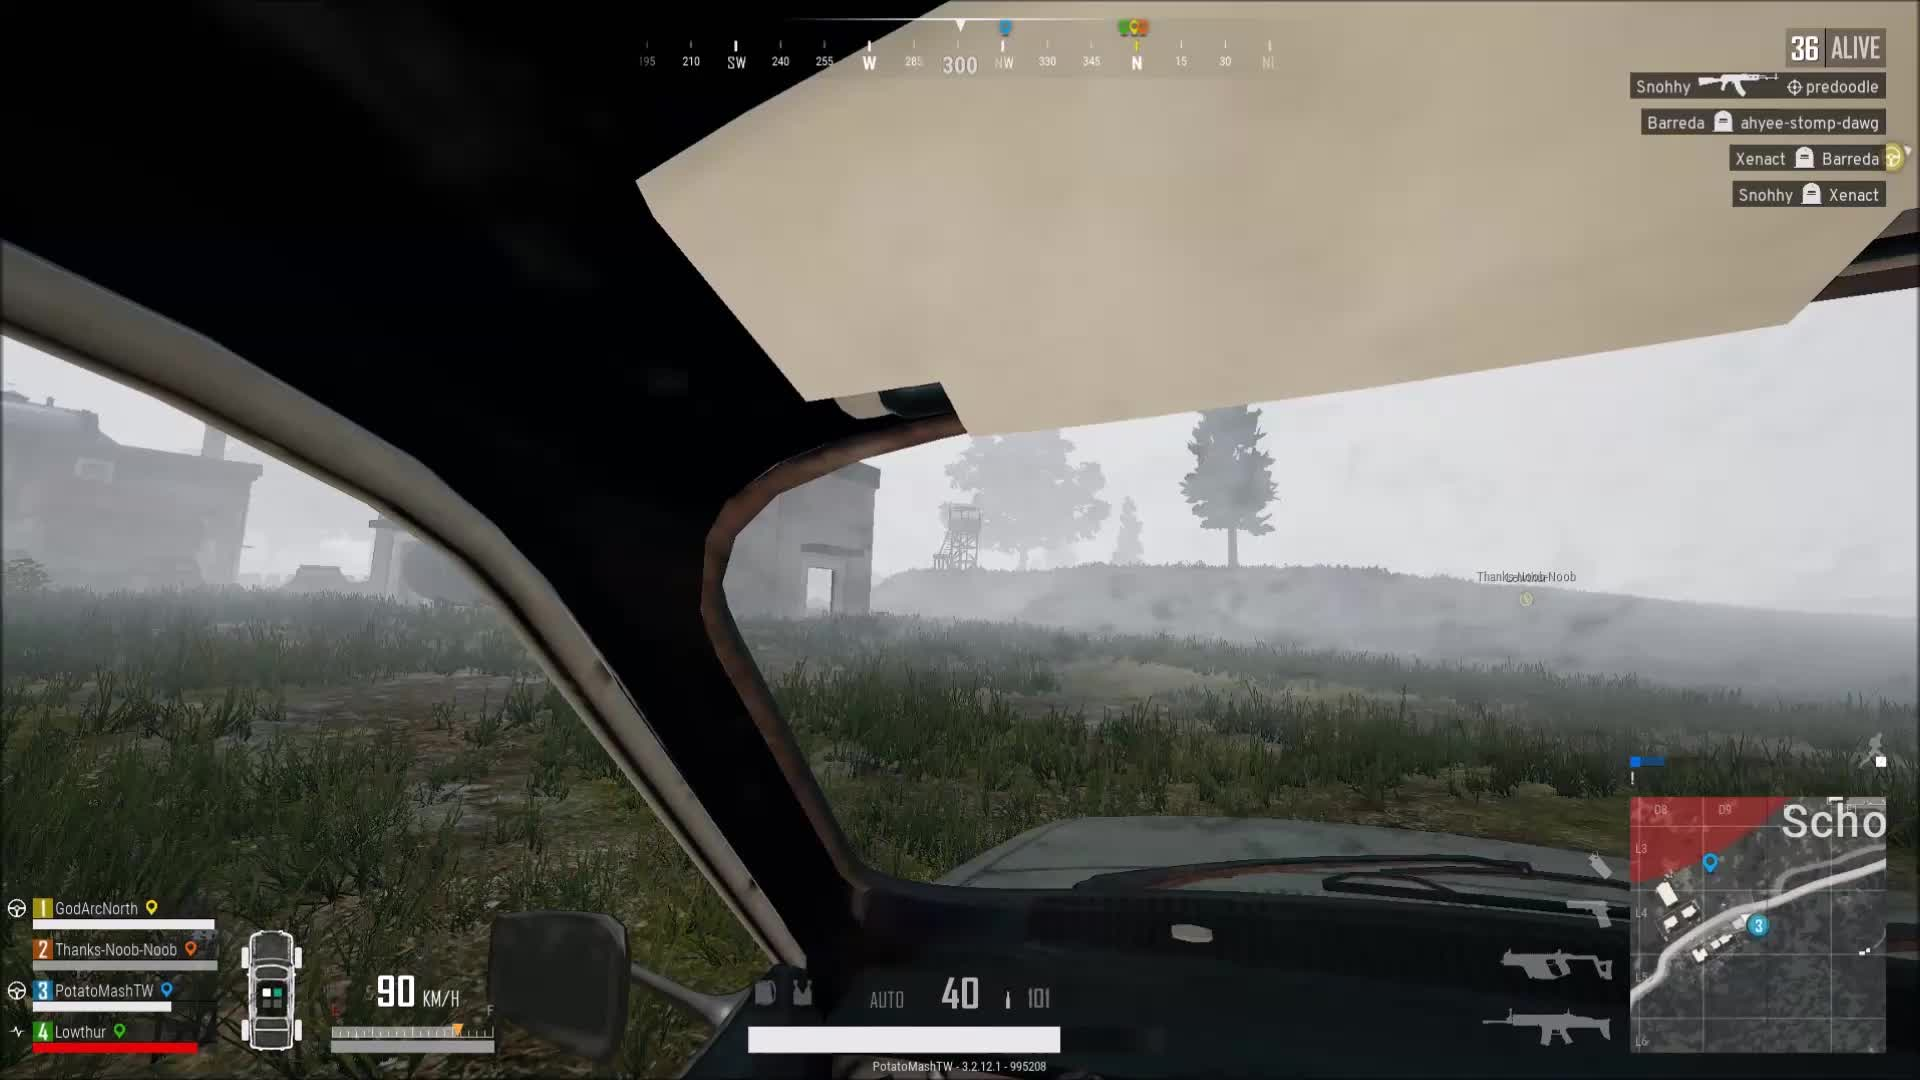 Best Driver GIFs